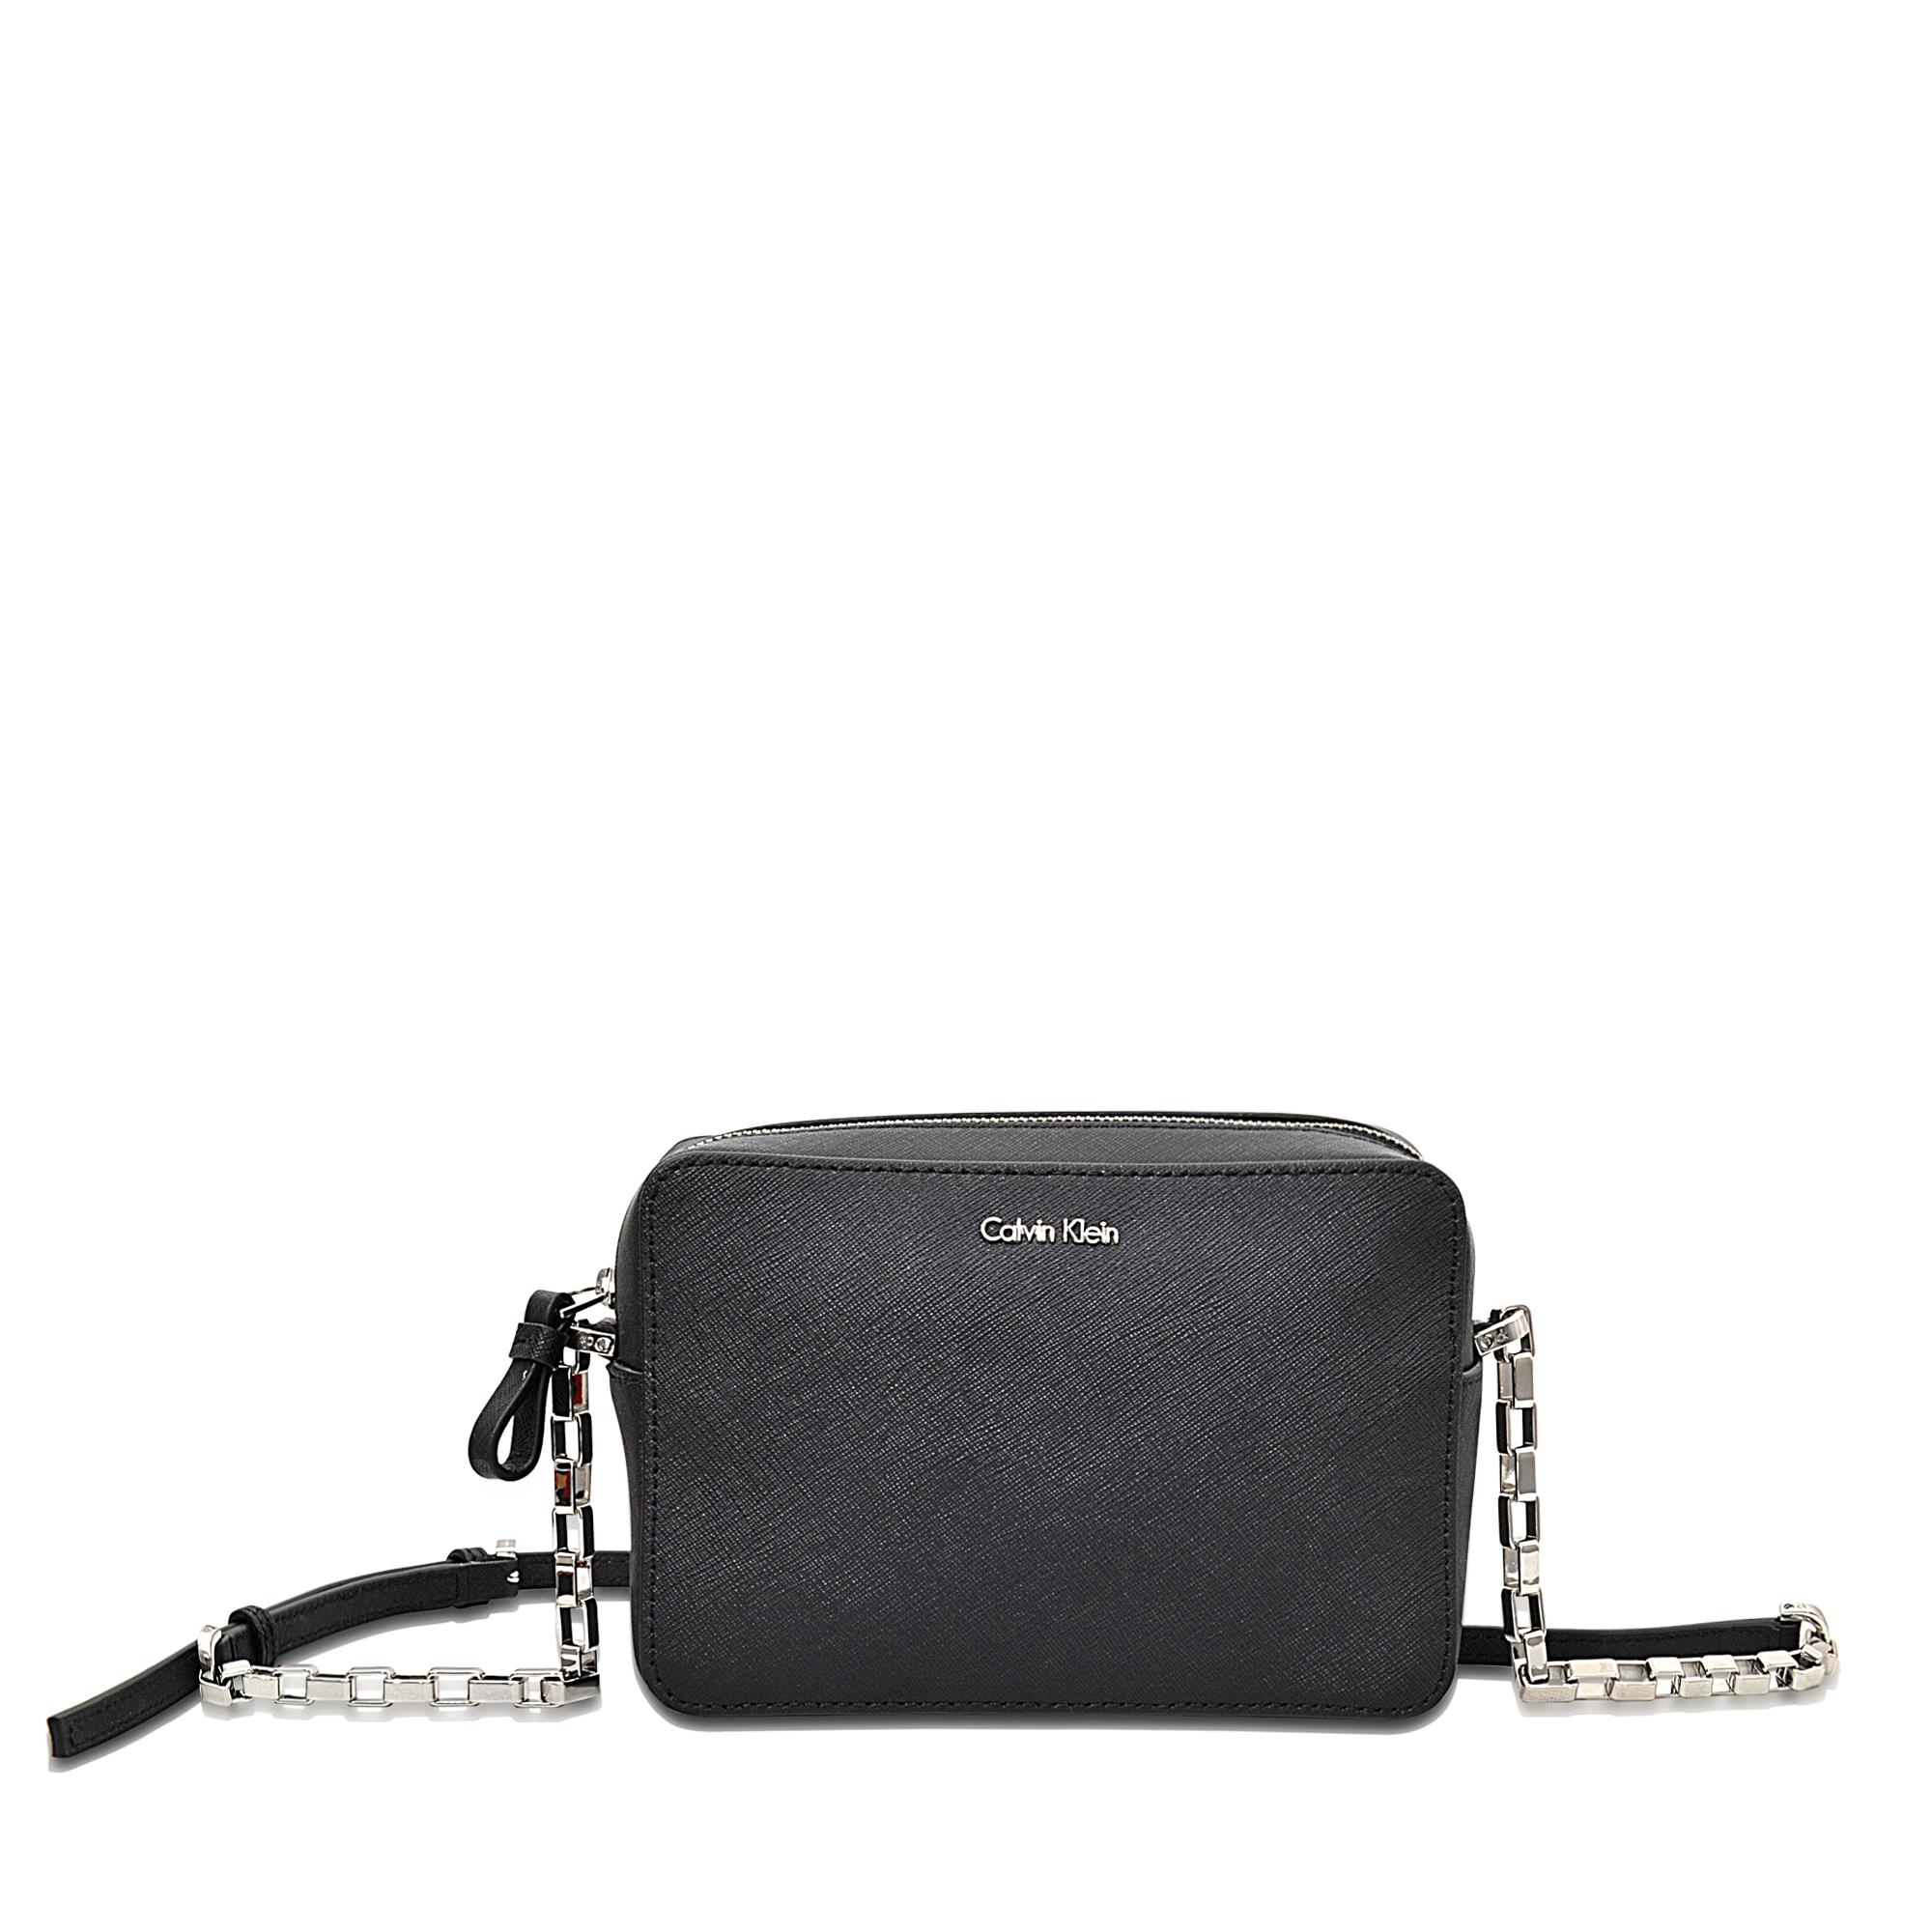 05919178d0 Calvin Klein Sofie Mini Crossbody Bag in Black - Lyst